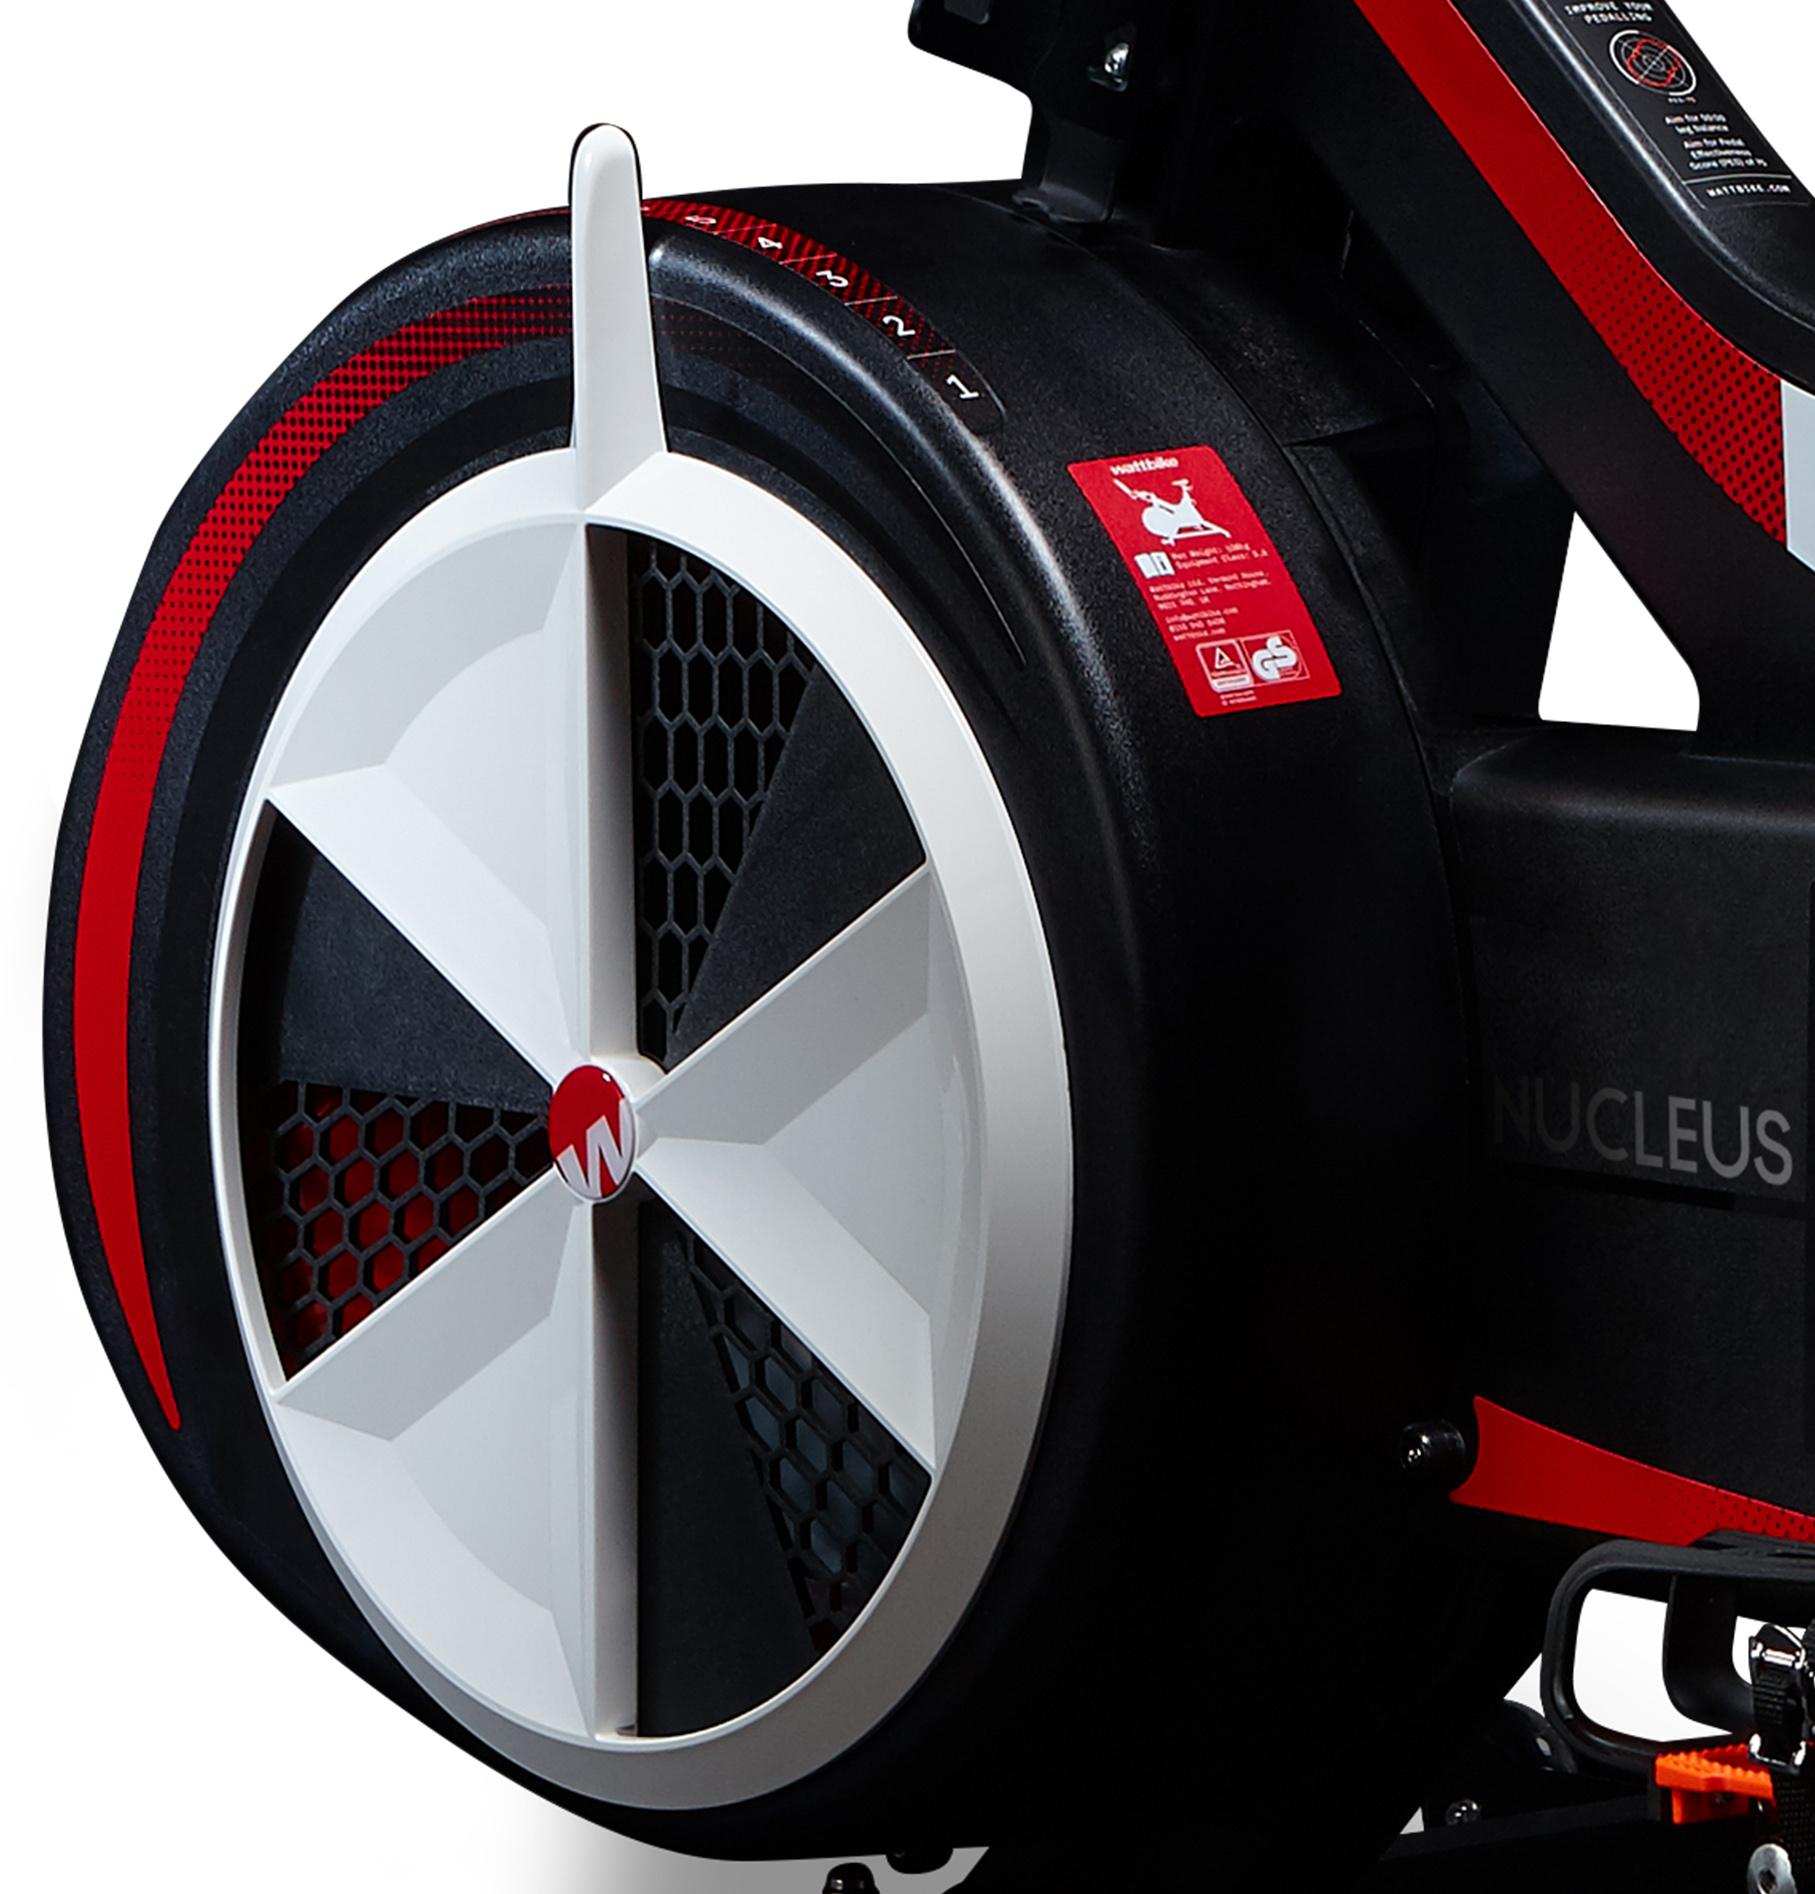 Wattbike-nukleus-widerstand